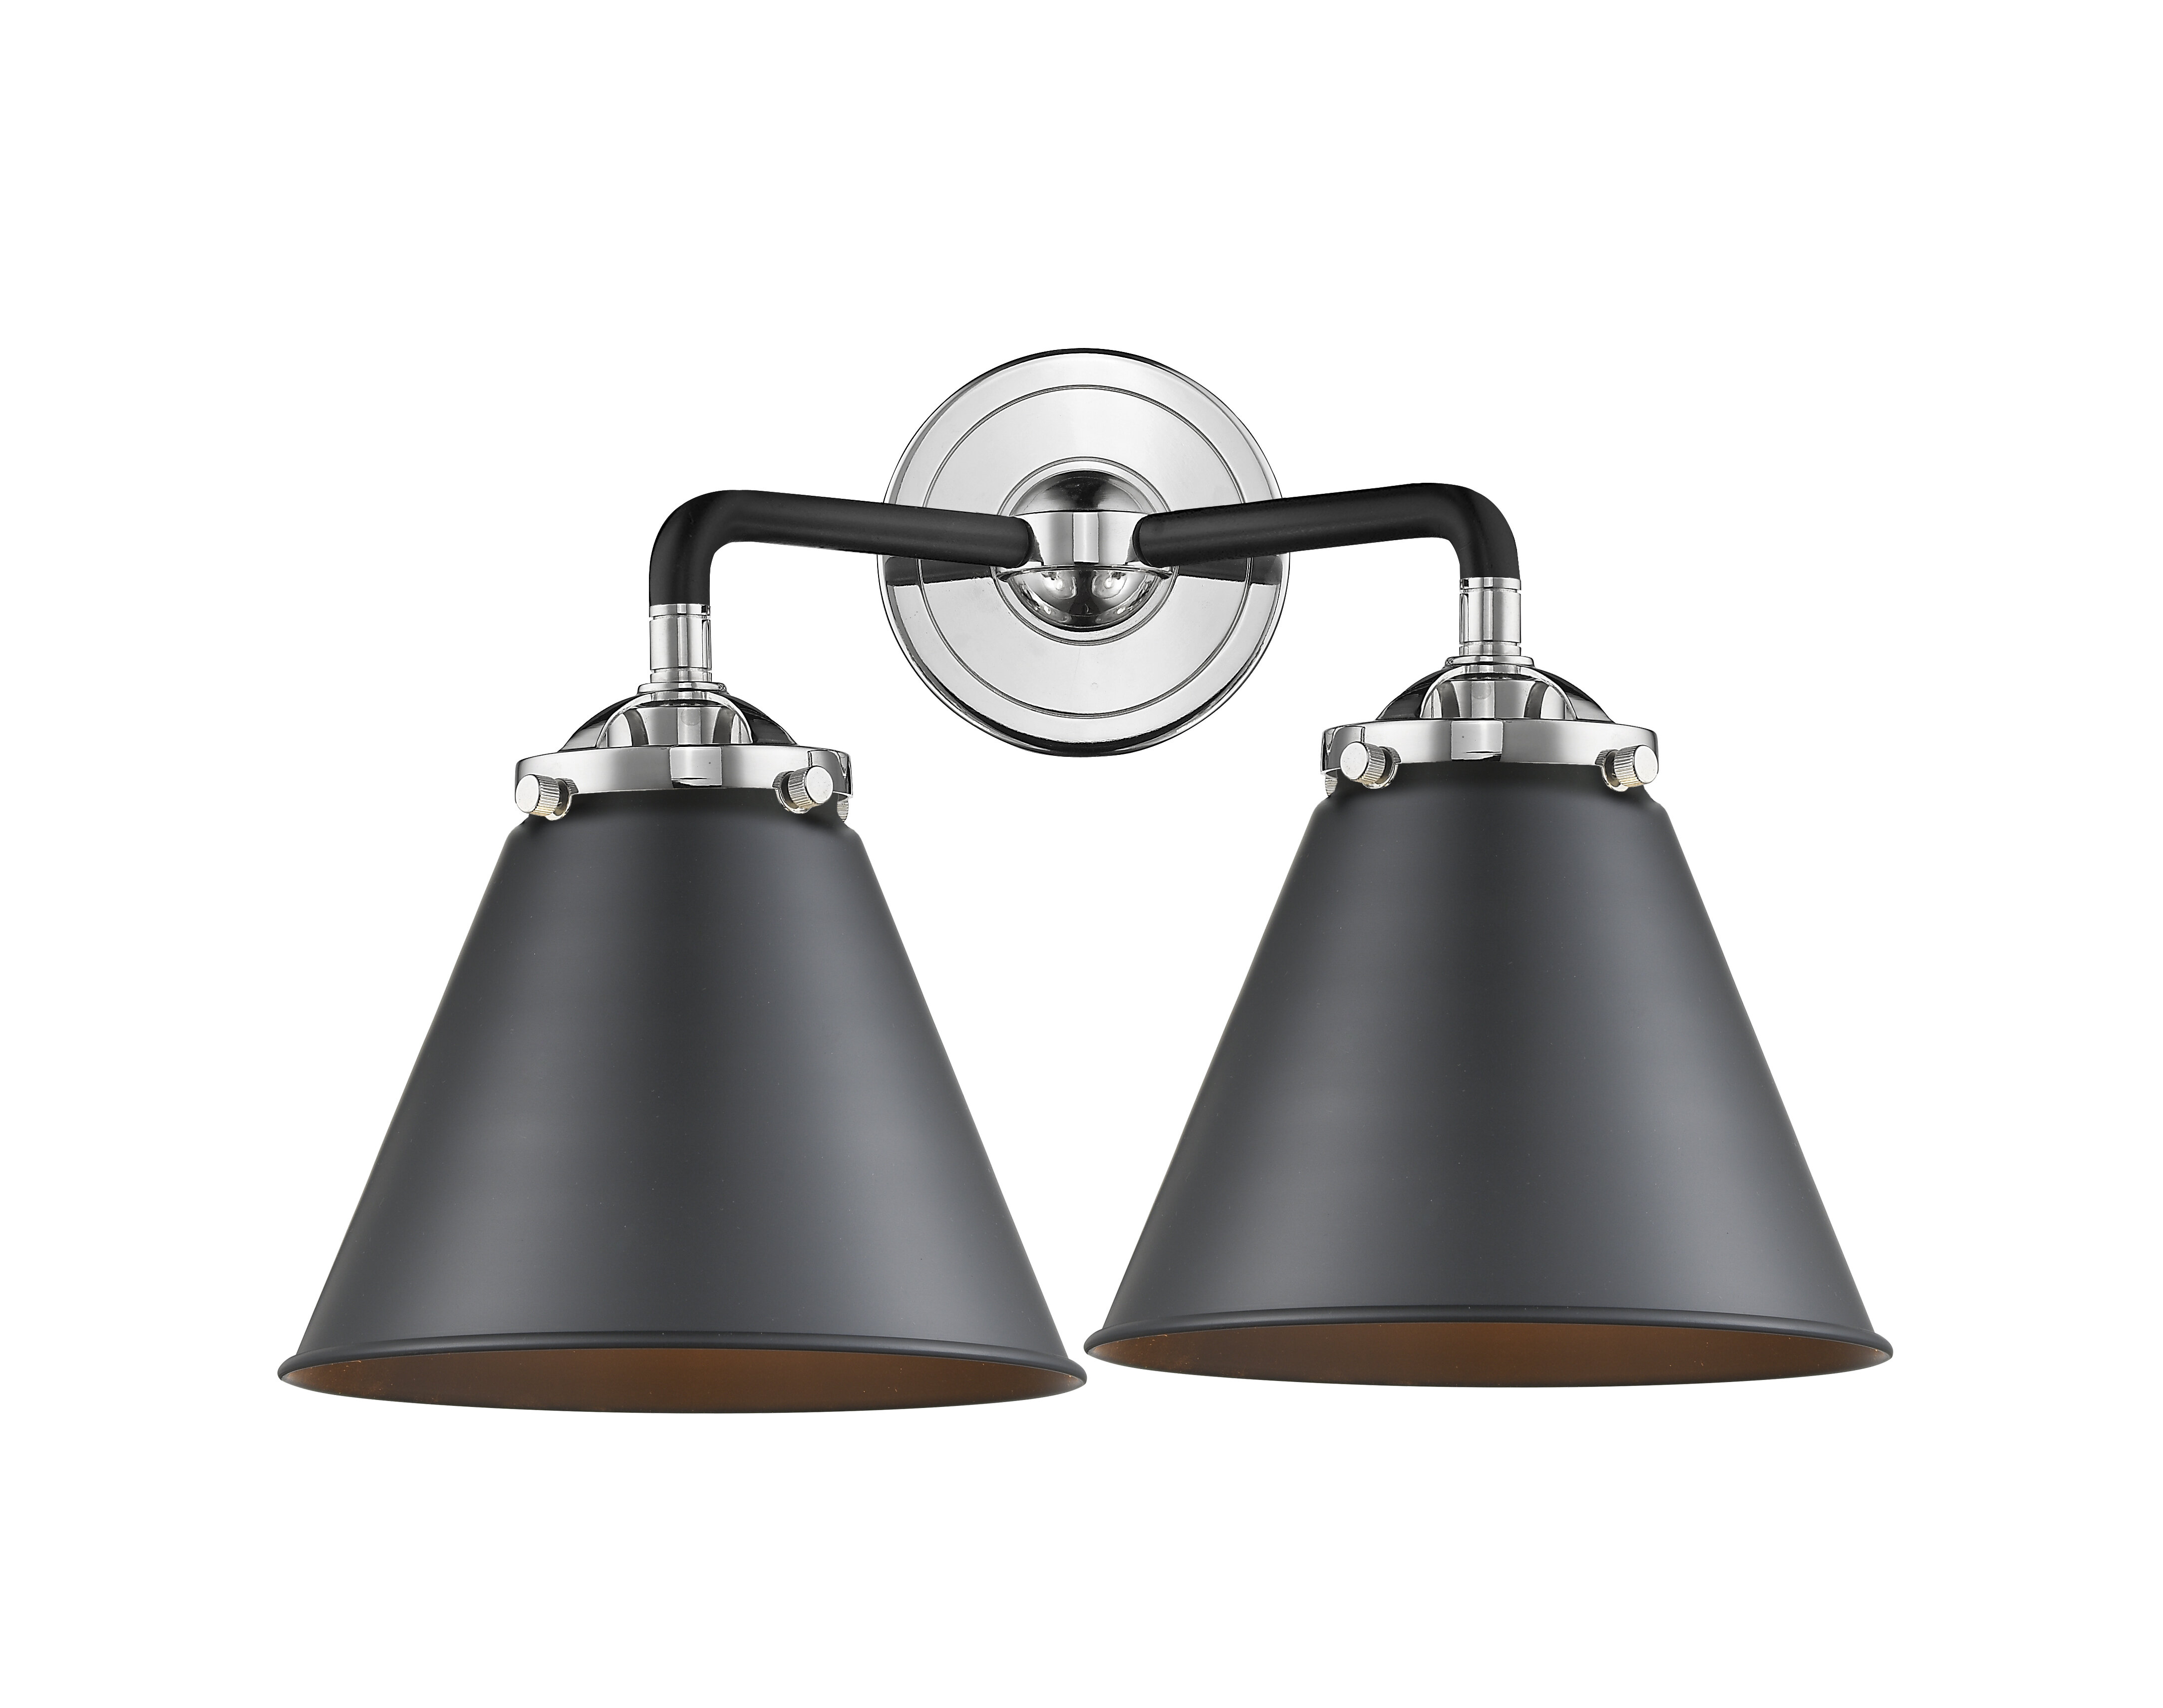 Greyleigh Donovan Bathroom Fixture 2 Light Vanity Light Wayfair